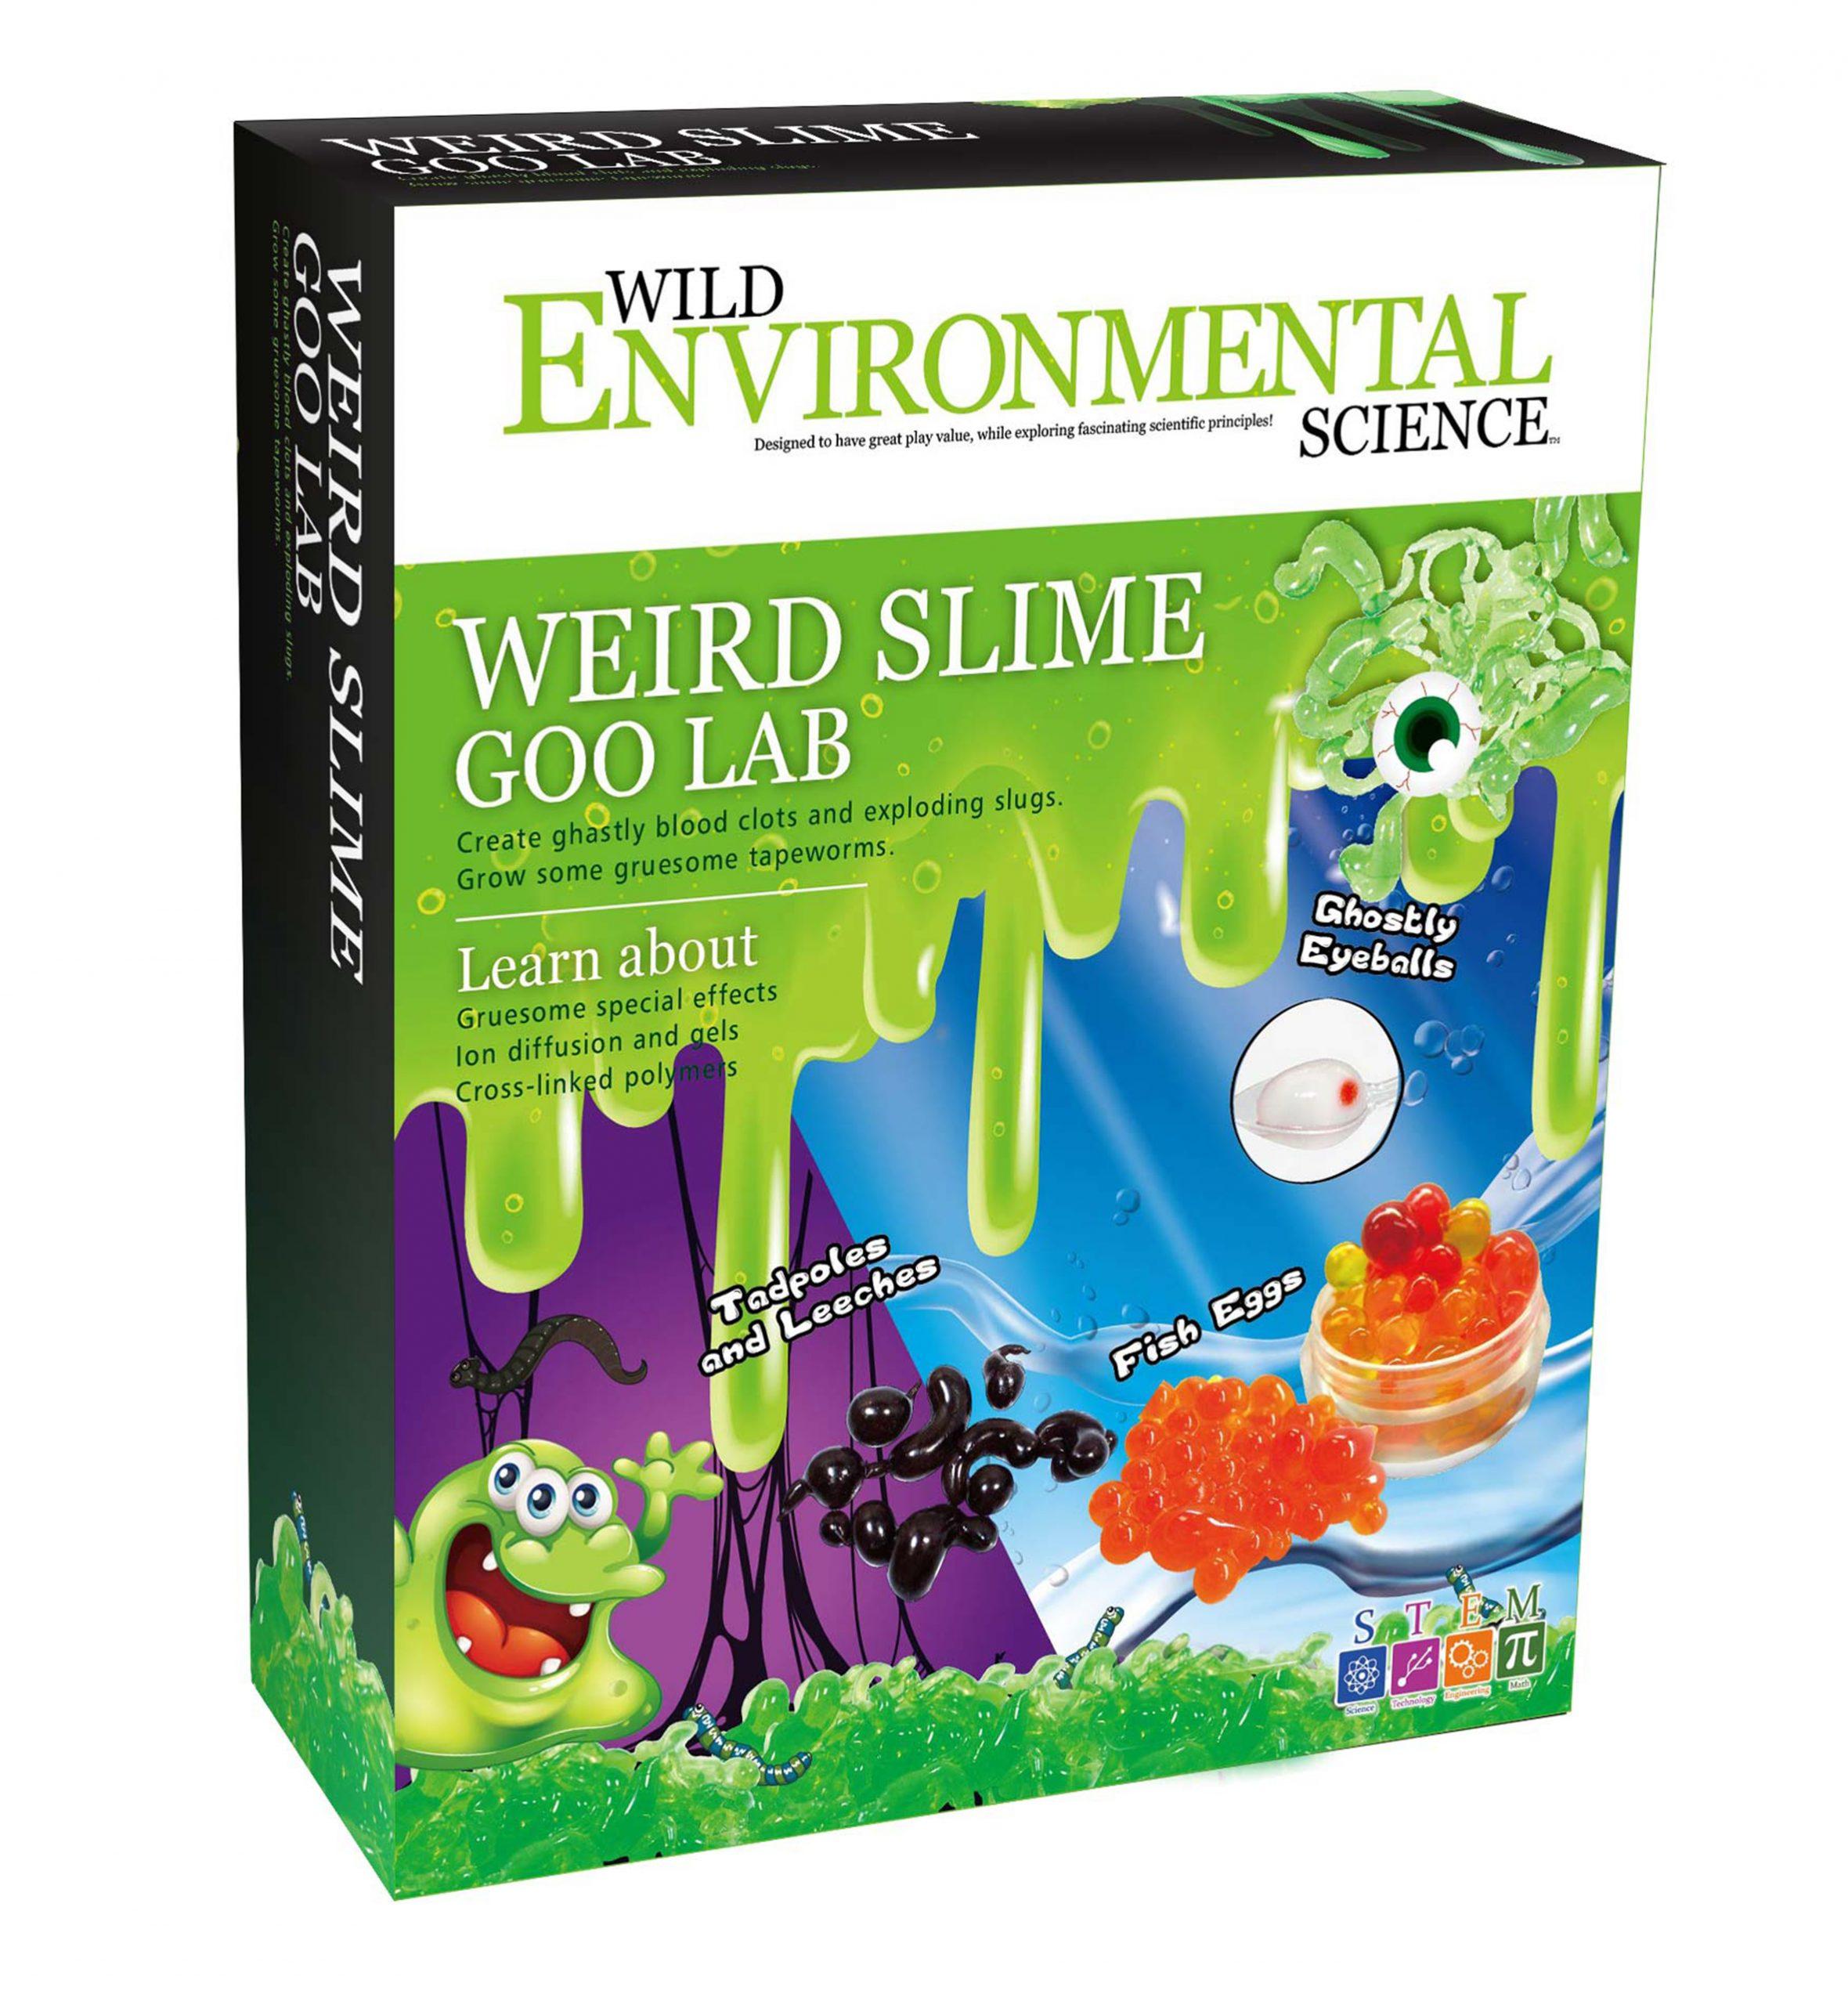 Weird Slime Goo Lab